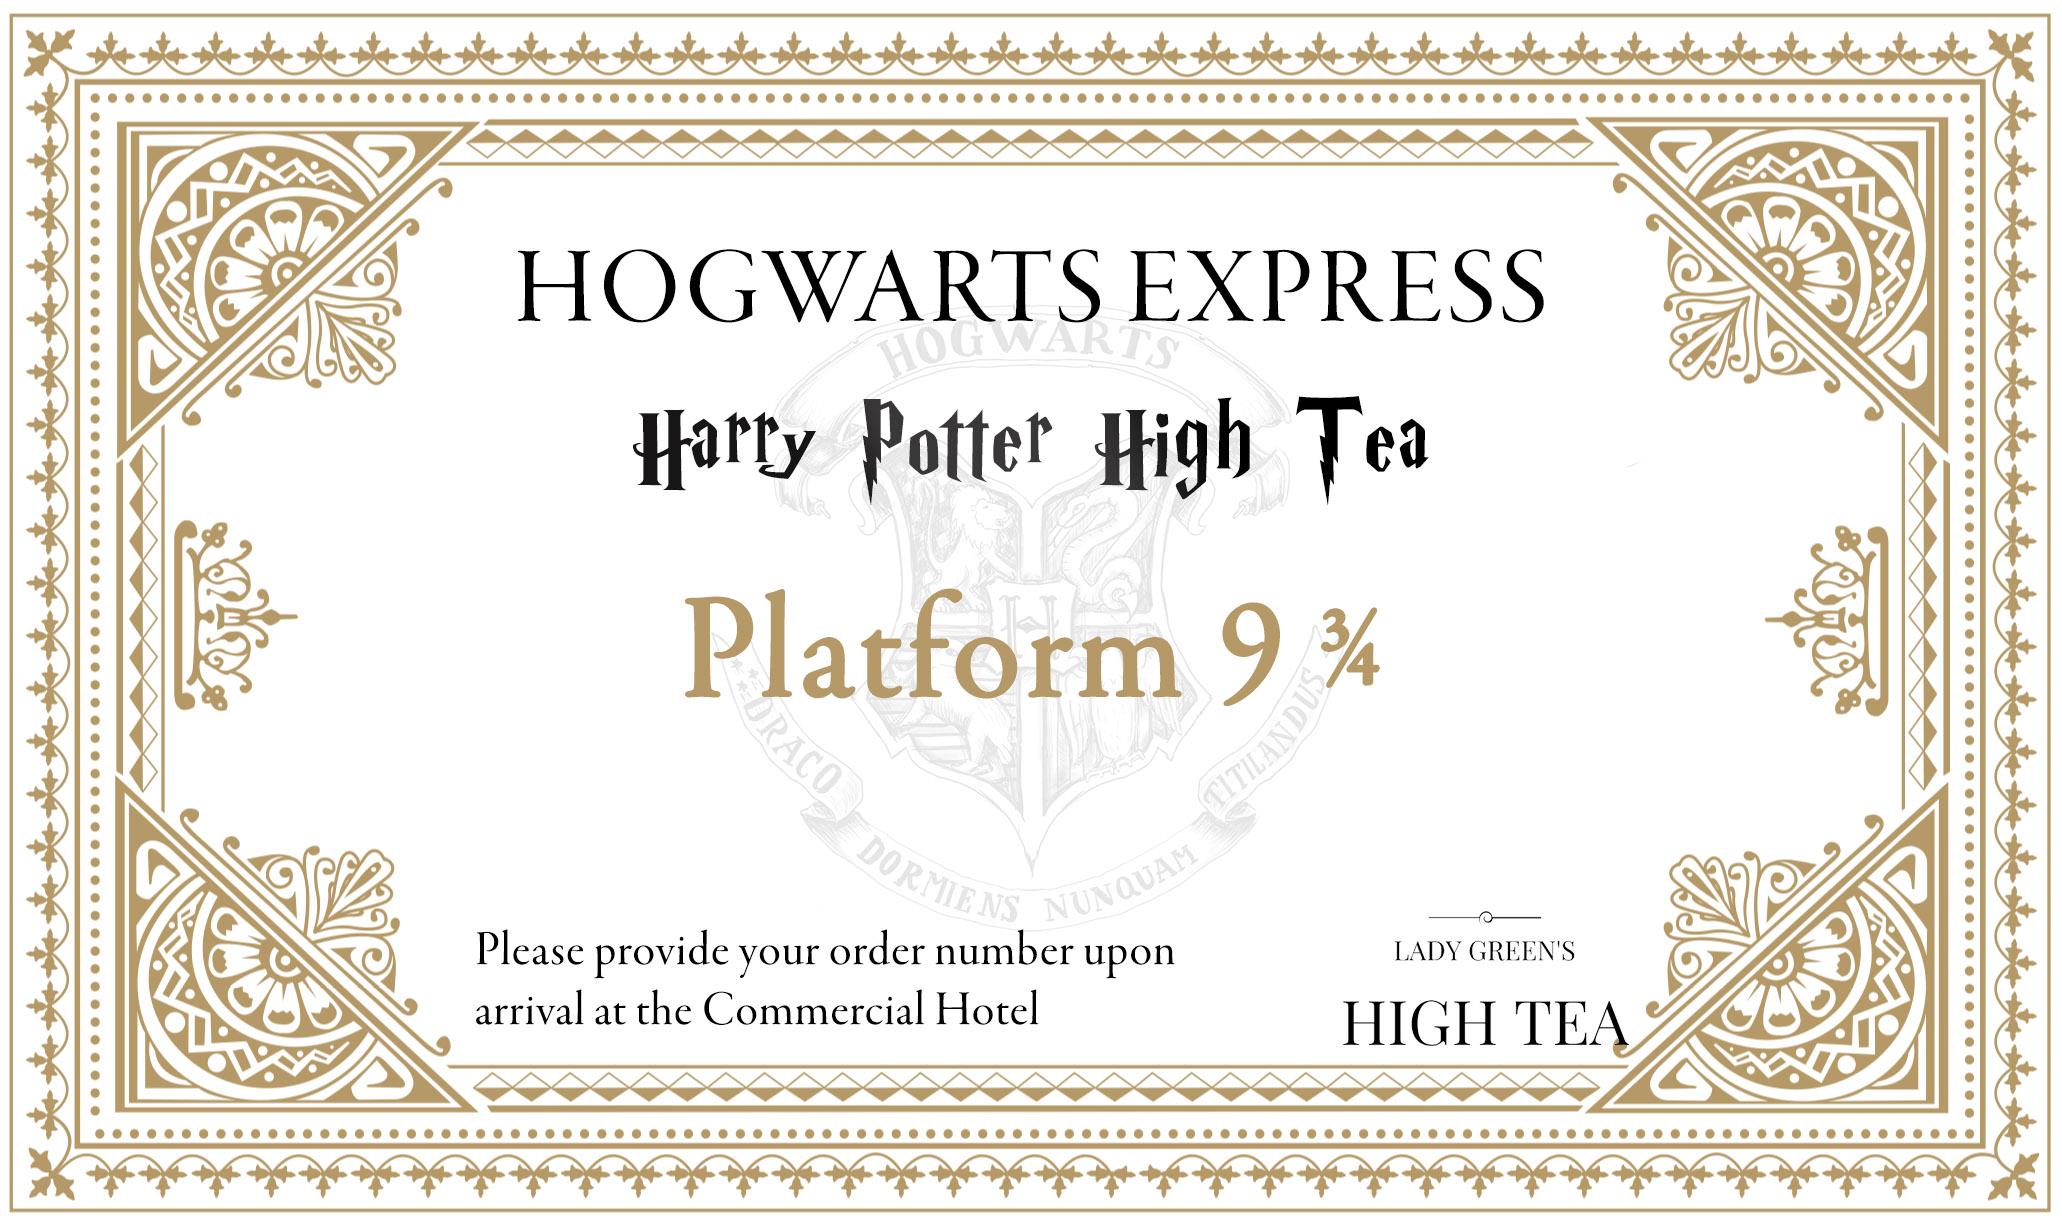 Hogwarts Express Ticket - Lady Green's High Tea.jpg